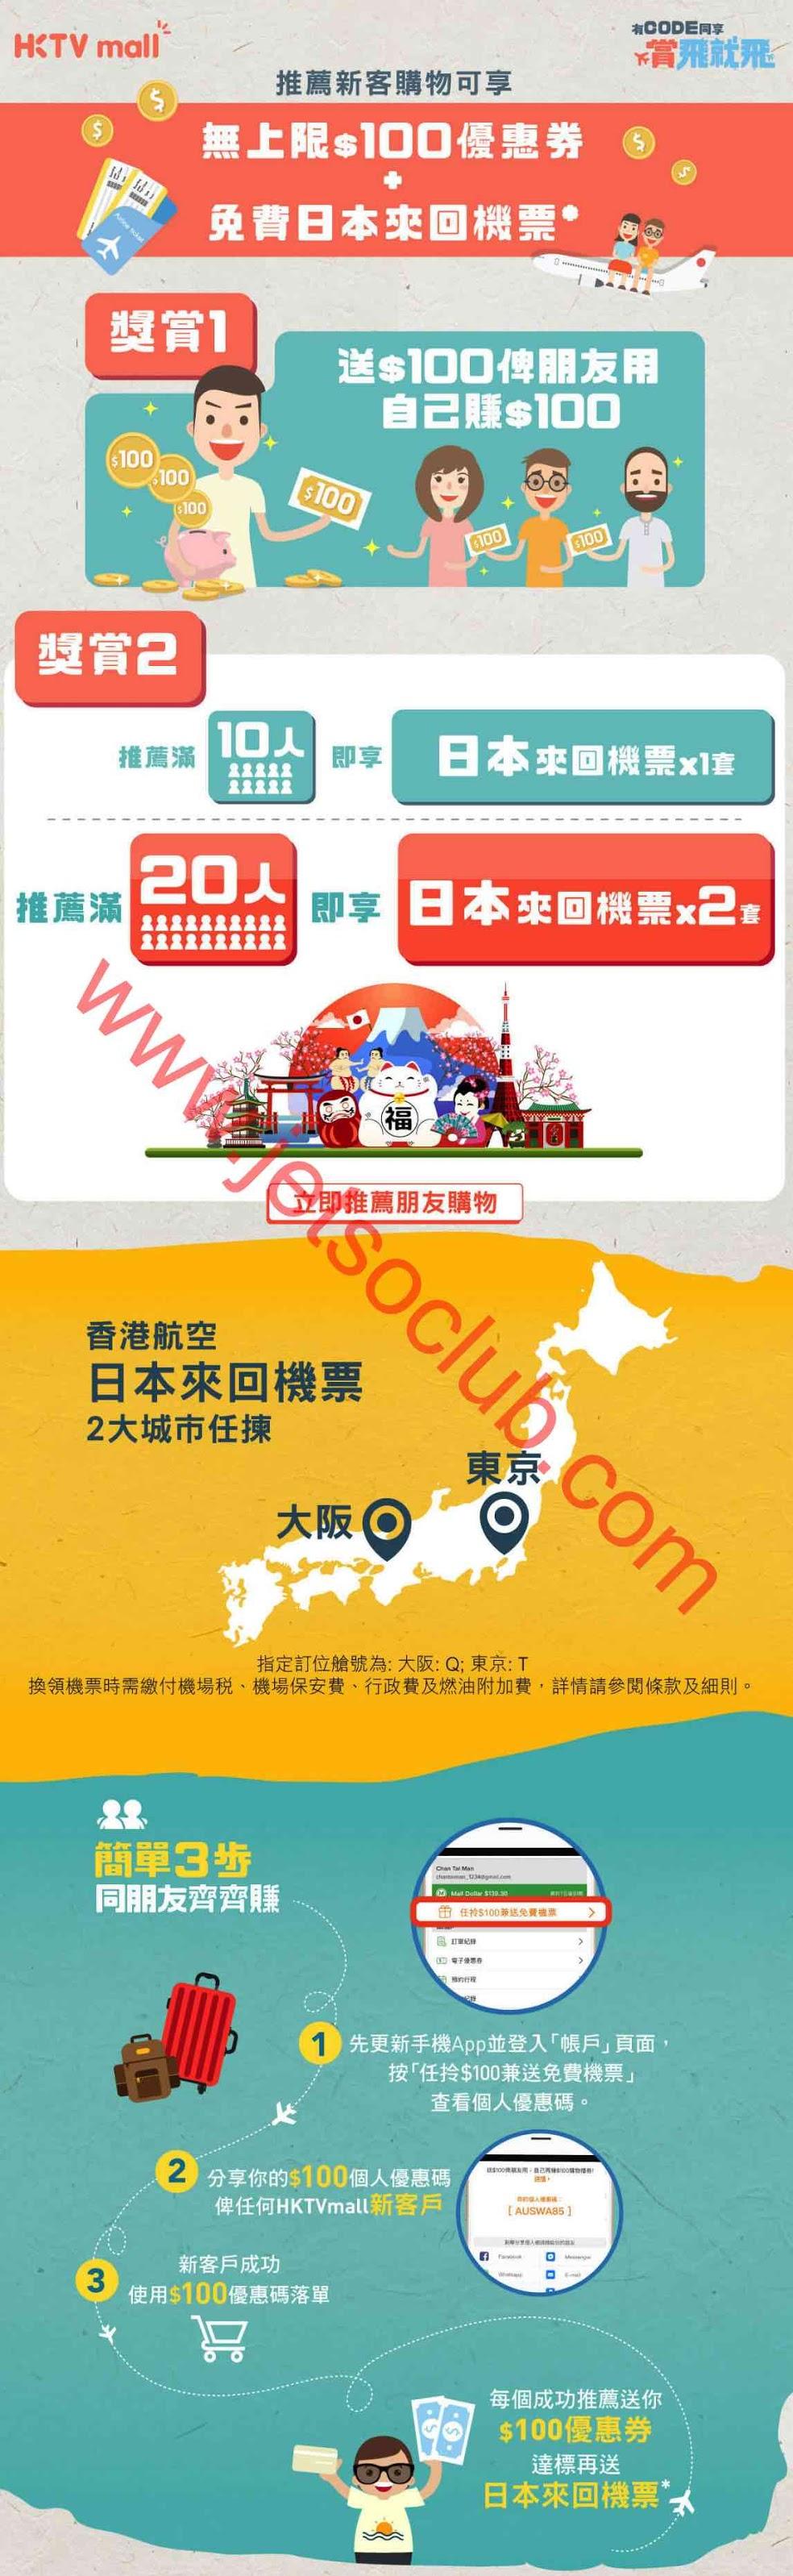 HKTV mall:推薦新客 無上限$100優惠券 + 免費日本來回機票(至15/5) ( Jetso Club 著數俱樂部 )